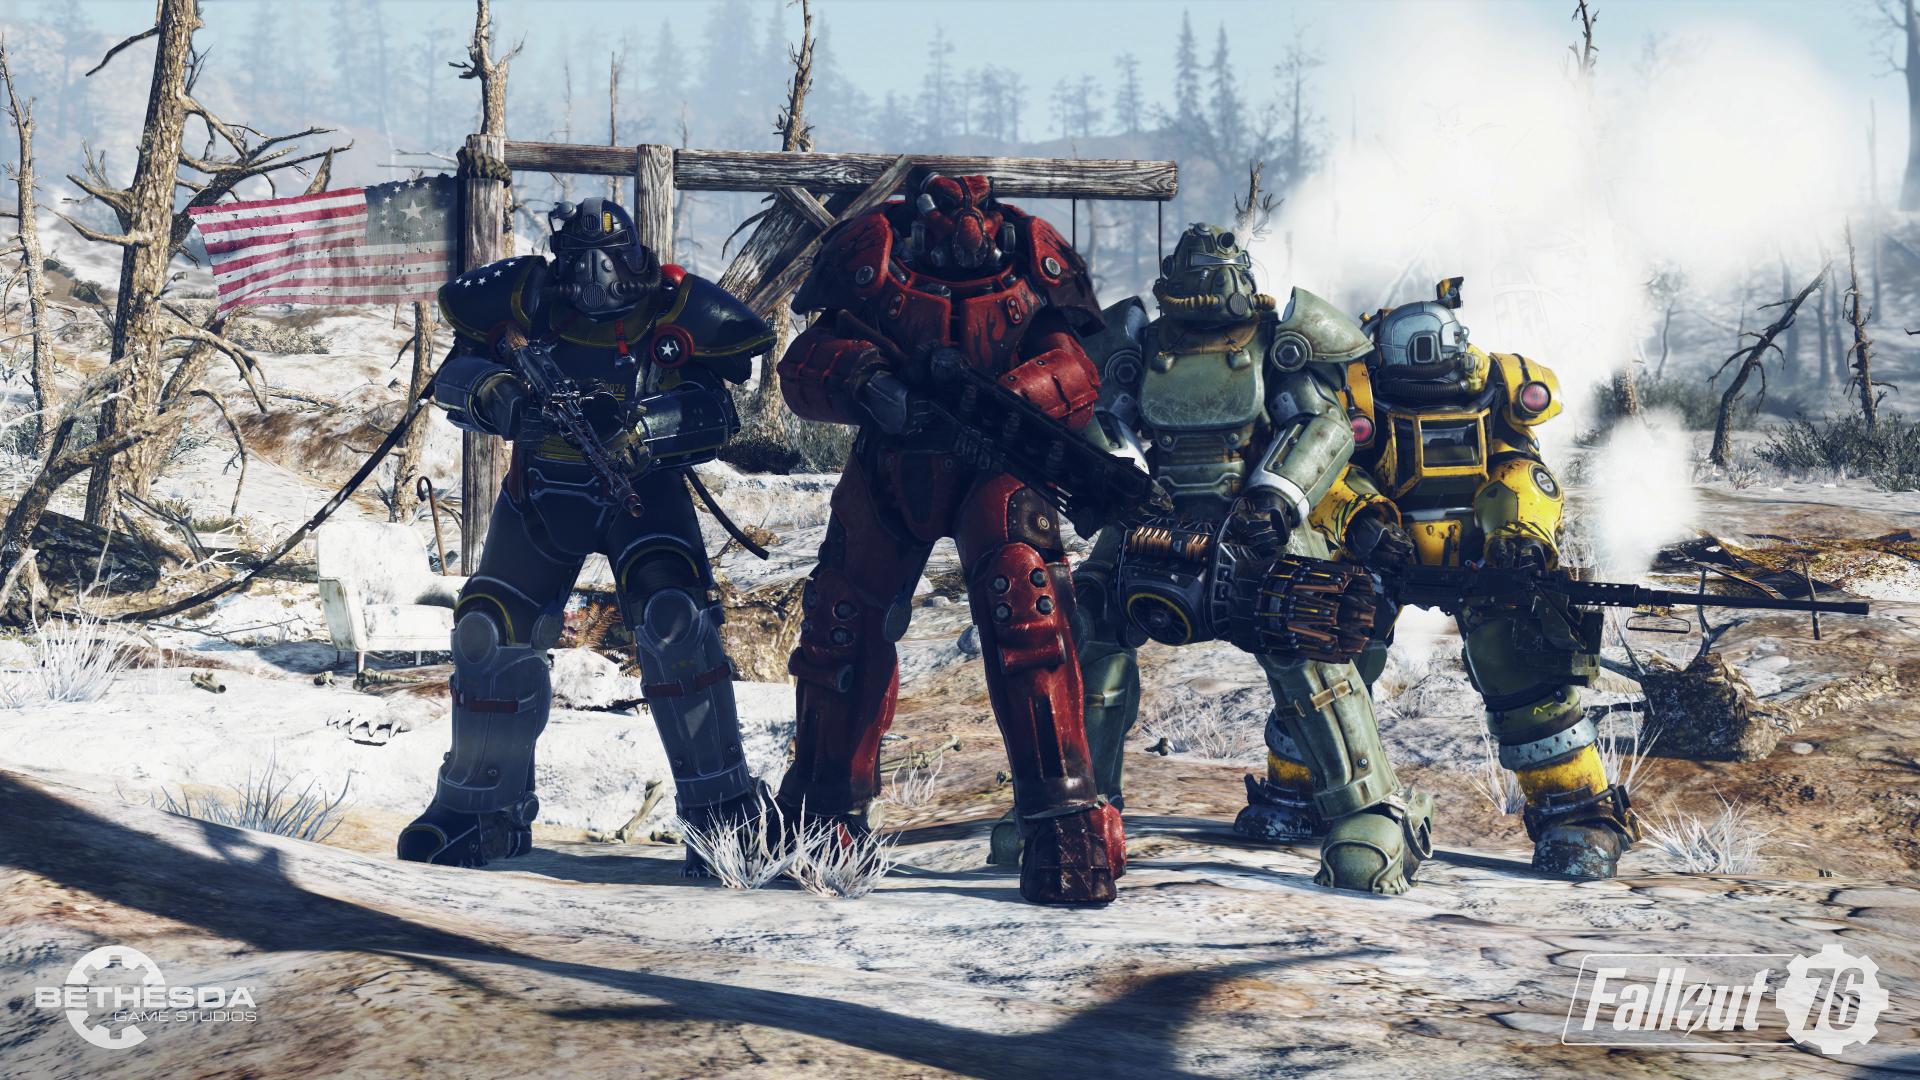 Fallout76_E3_PowerArmors.png